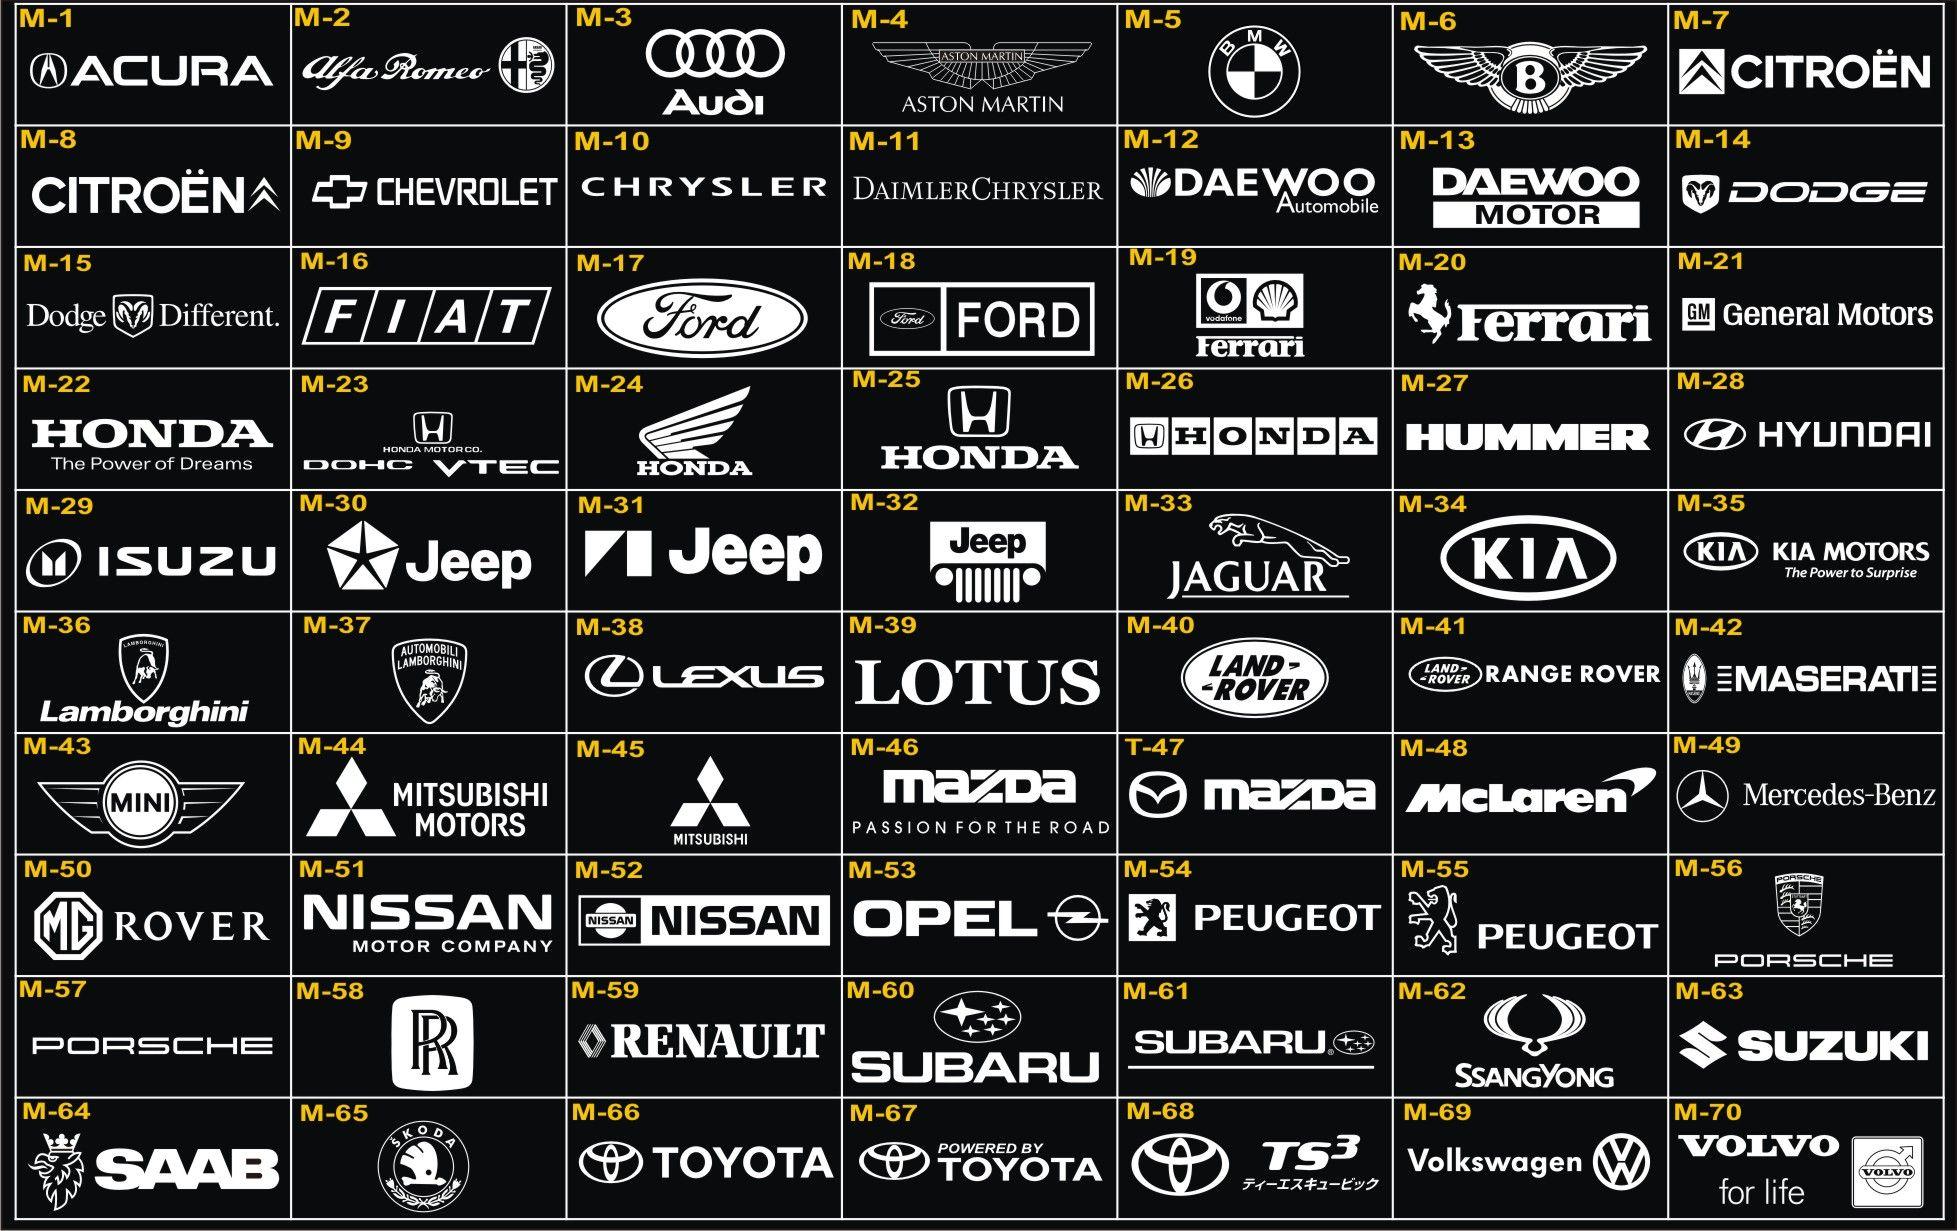 Toyota TRD Mazda GSR Sponsor 500 Design Stickers Decals